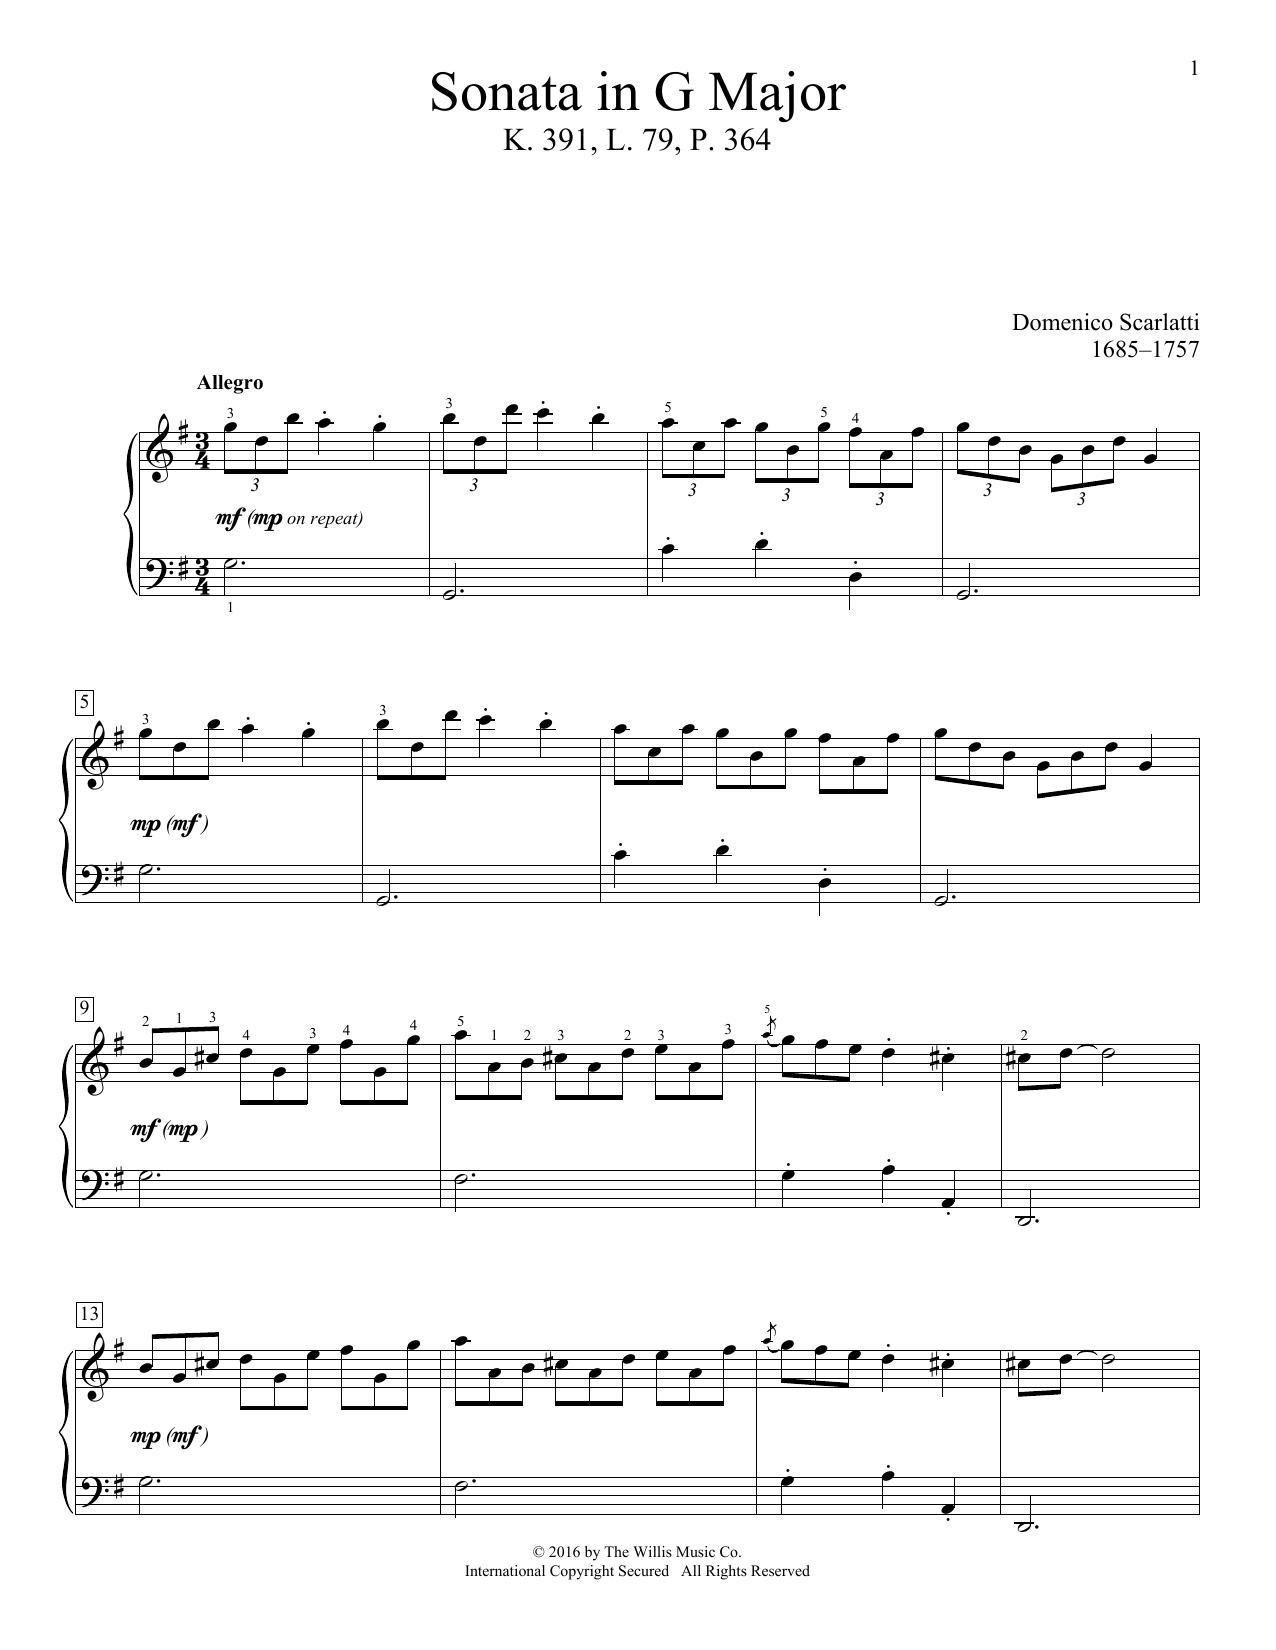 Domenico Scarlatti Sonata In G Major, K. 391, L. 79, P. 364 sheet music notes and chords. Download Printable PDF.